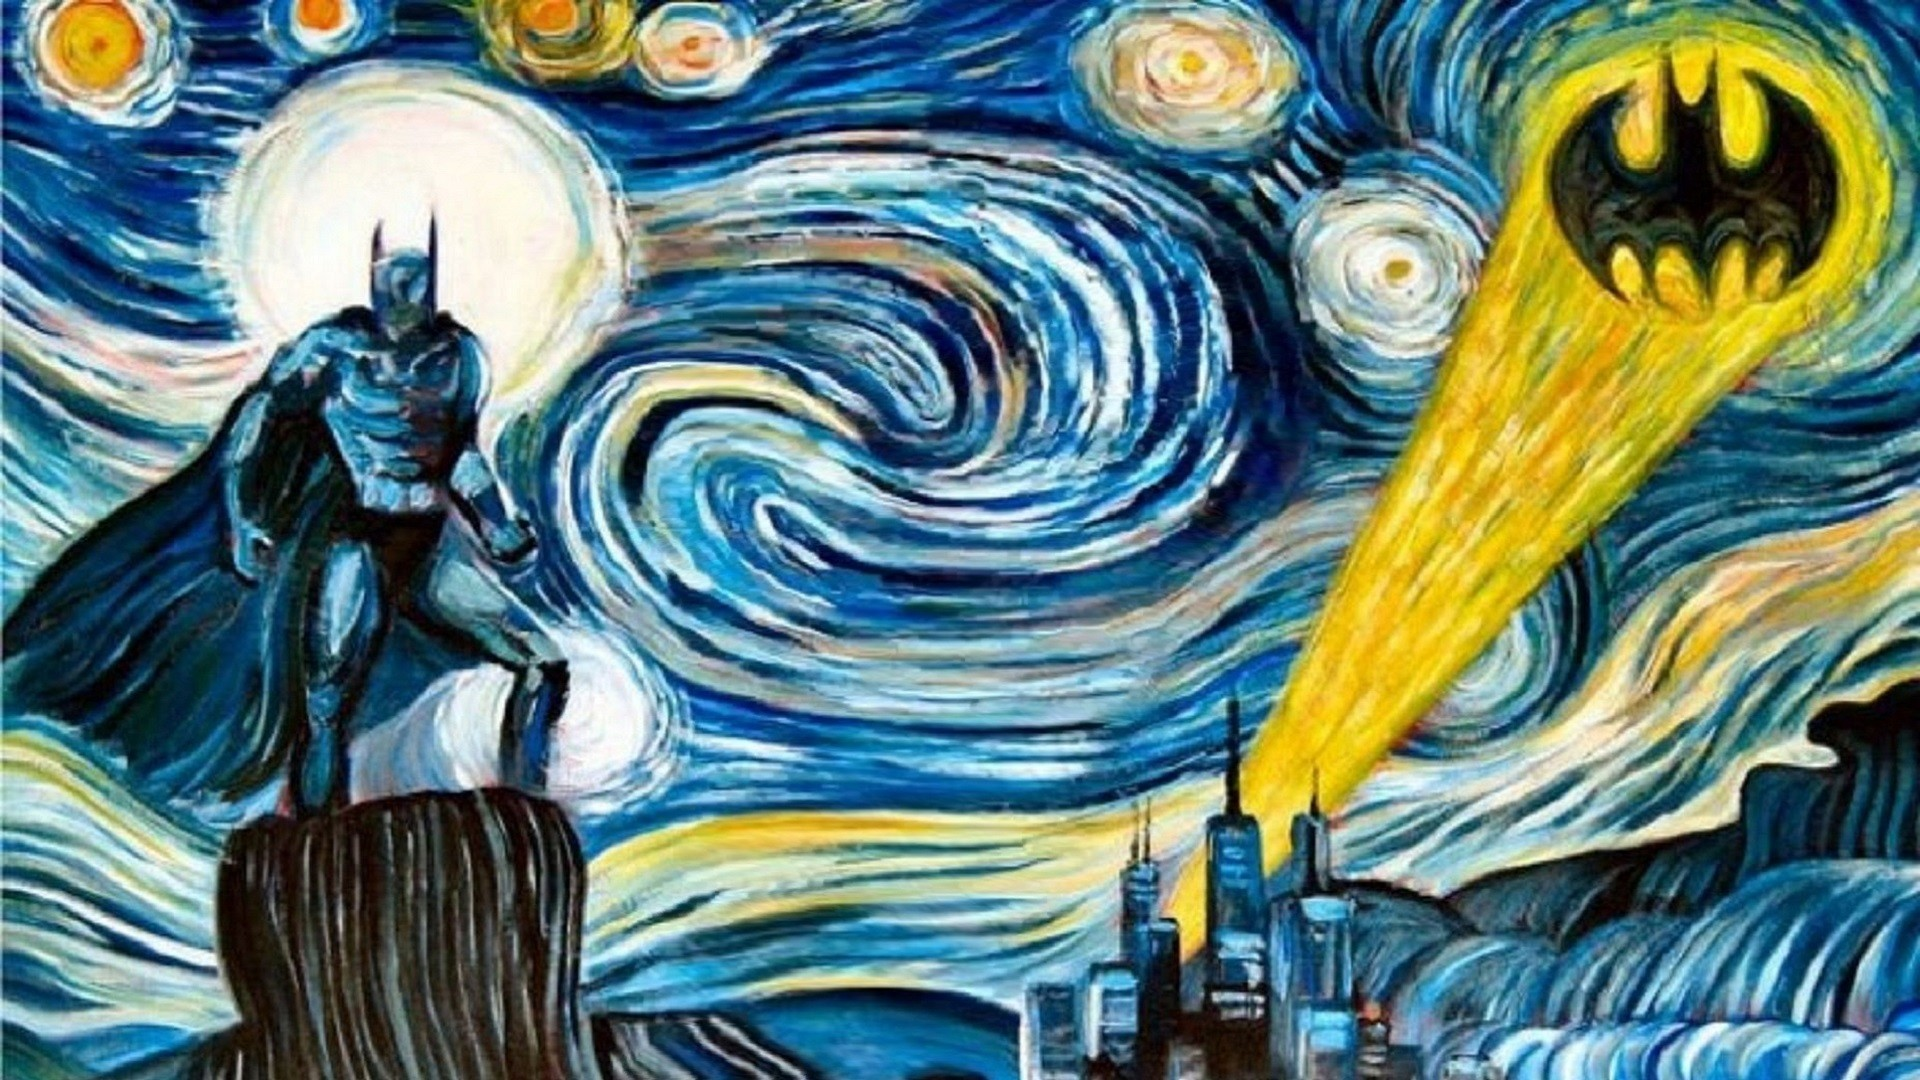 Van Gogh Exploding Tardis Wallpaper 57 Images